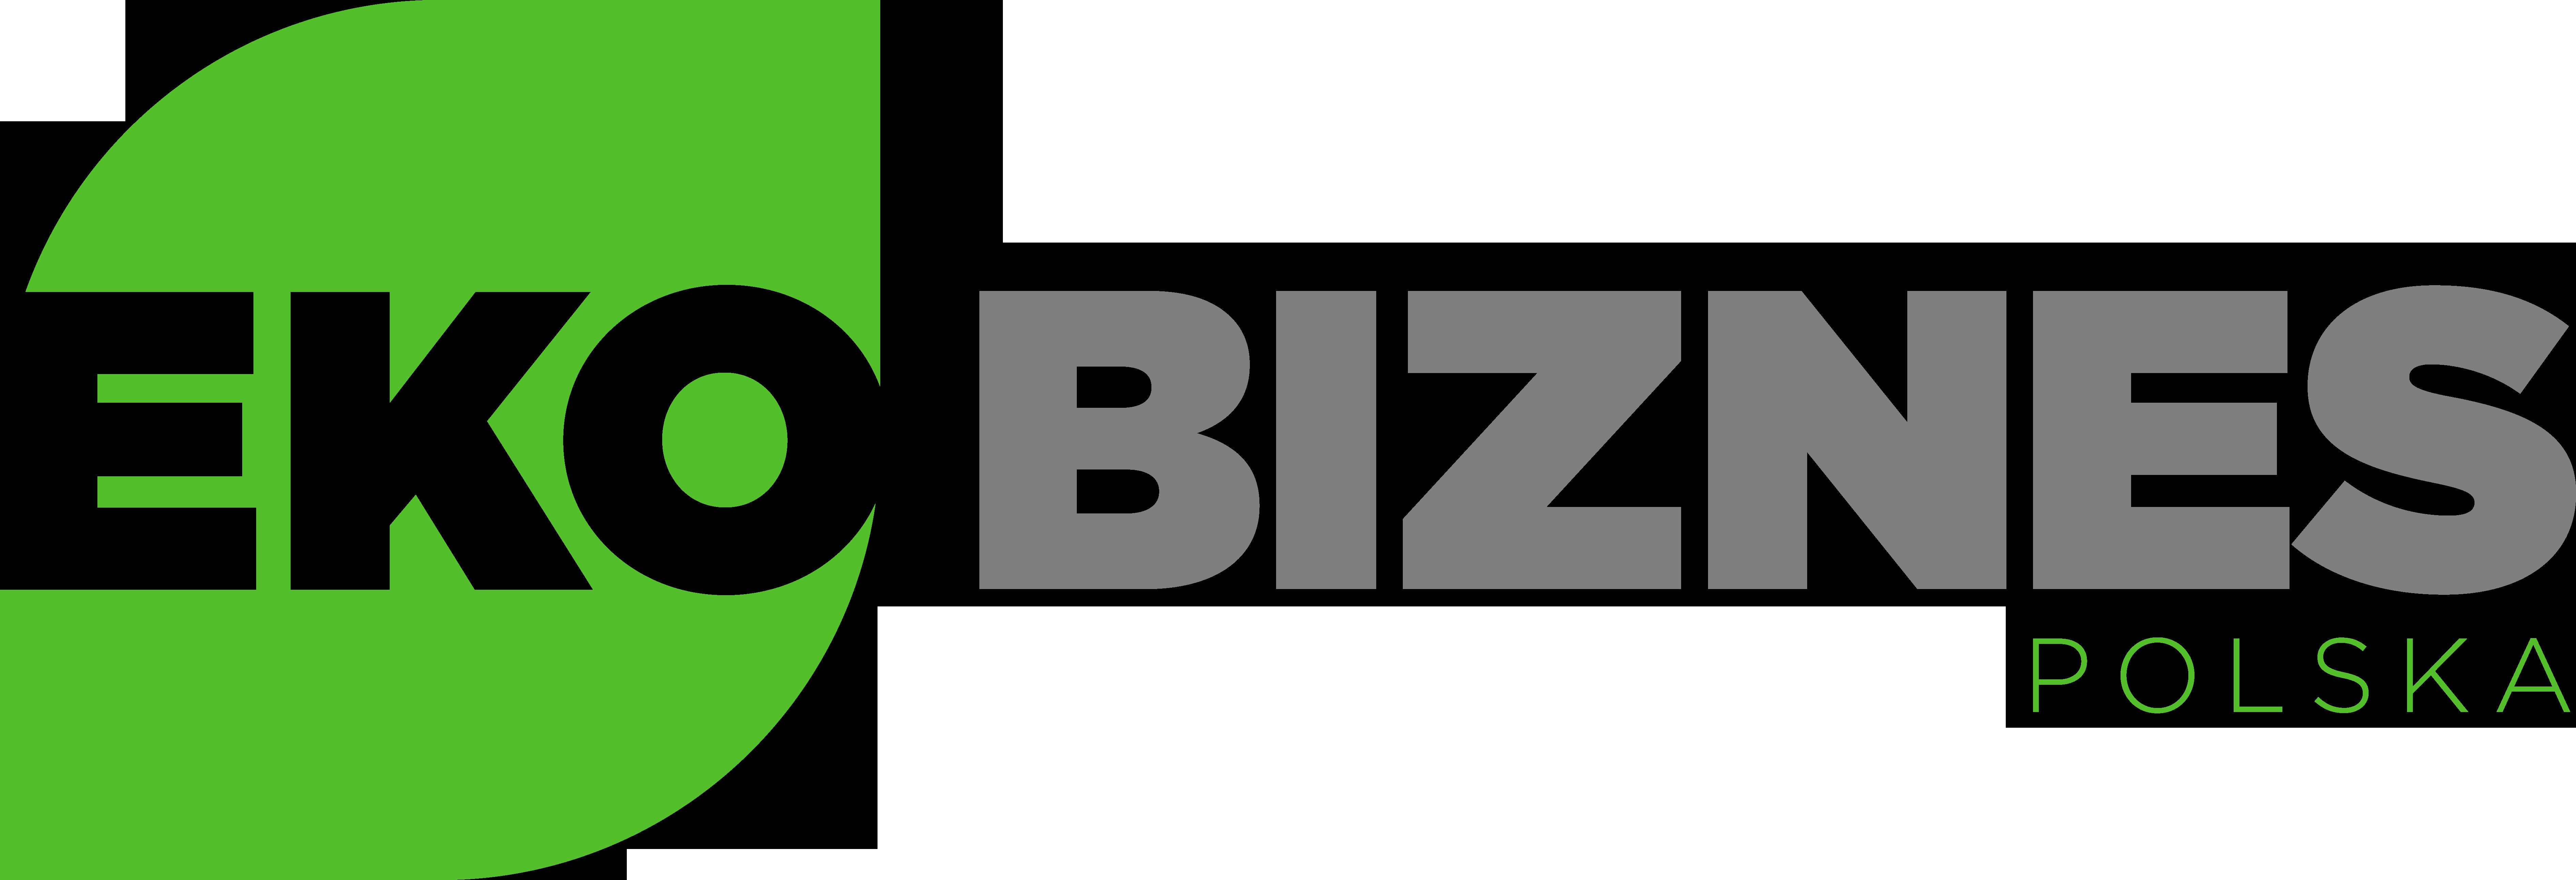 Eko-Biznes_Polska_Logo